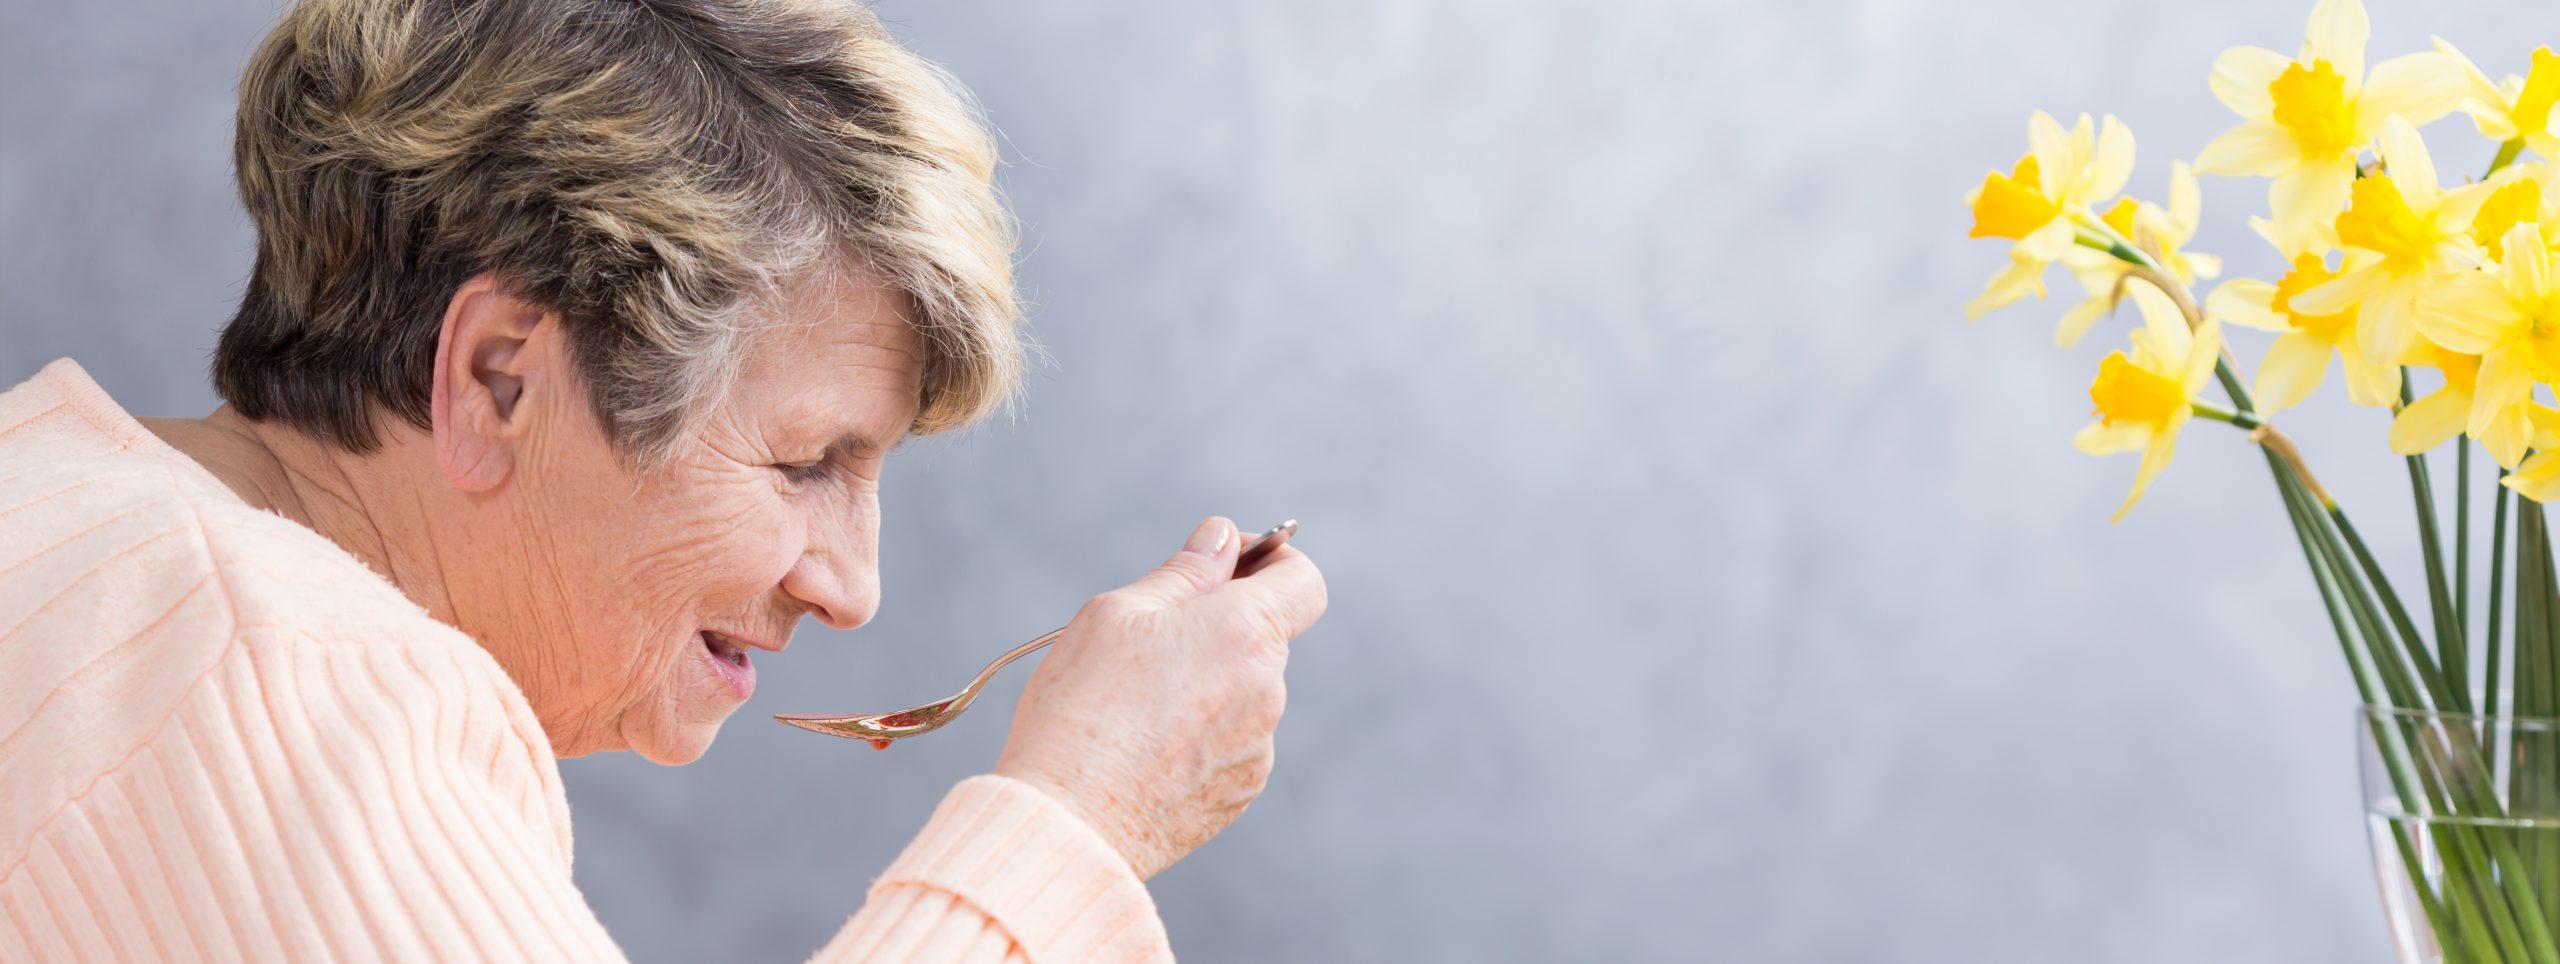 Femme agé qui mange philadom